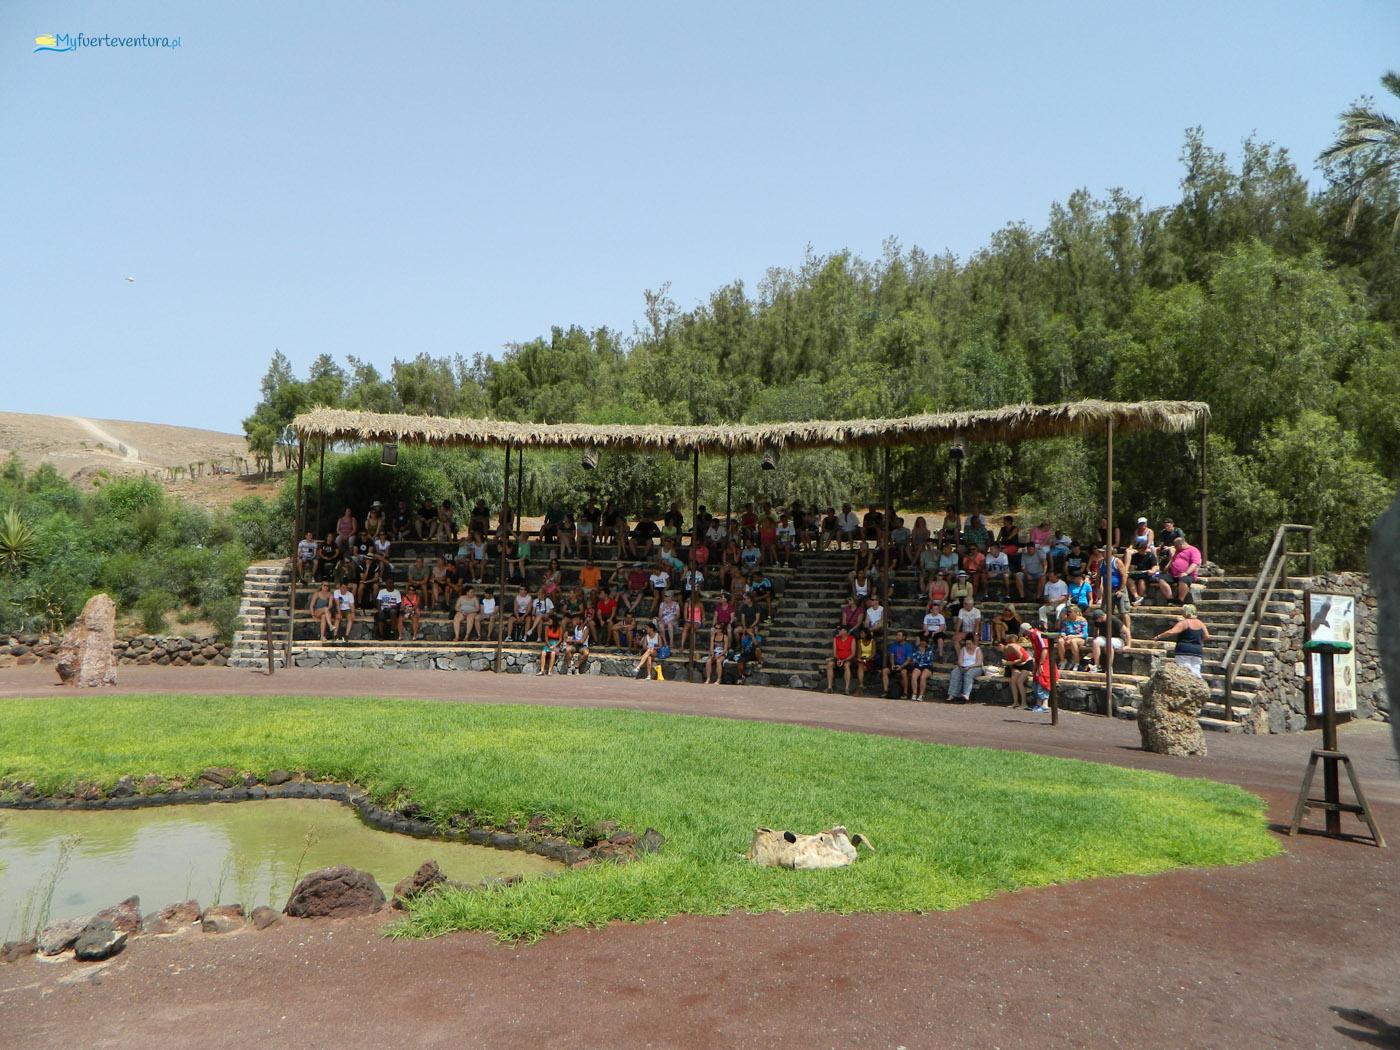 Oasis Park Fuerteventura - pokaz ptaków drapieżnych